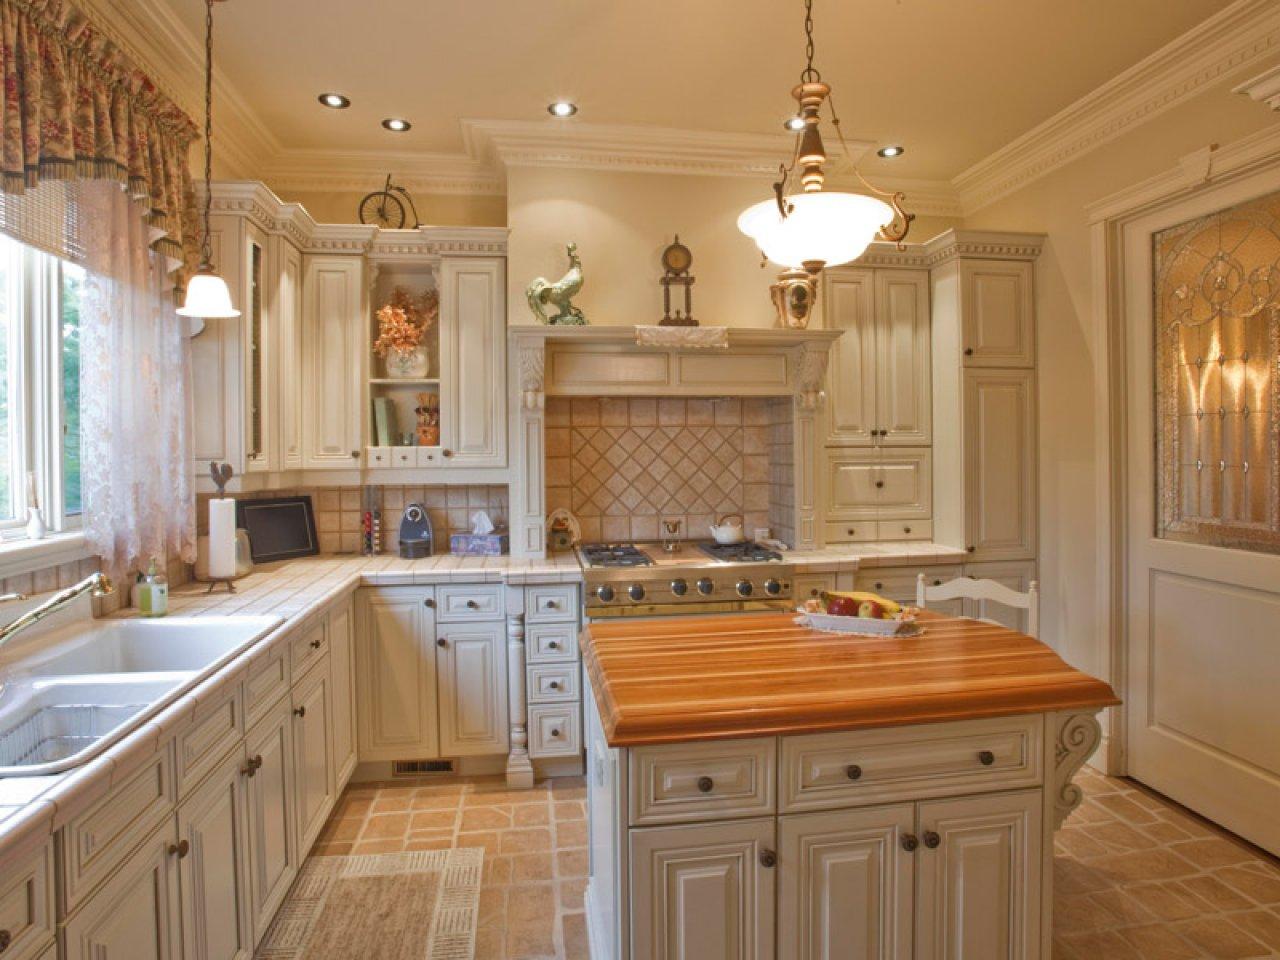 Architecture decoration design cuisine for La cuisine classique